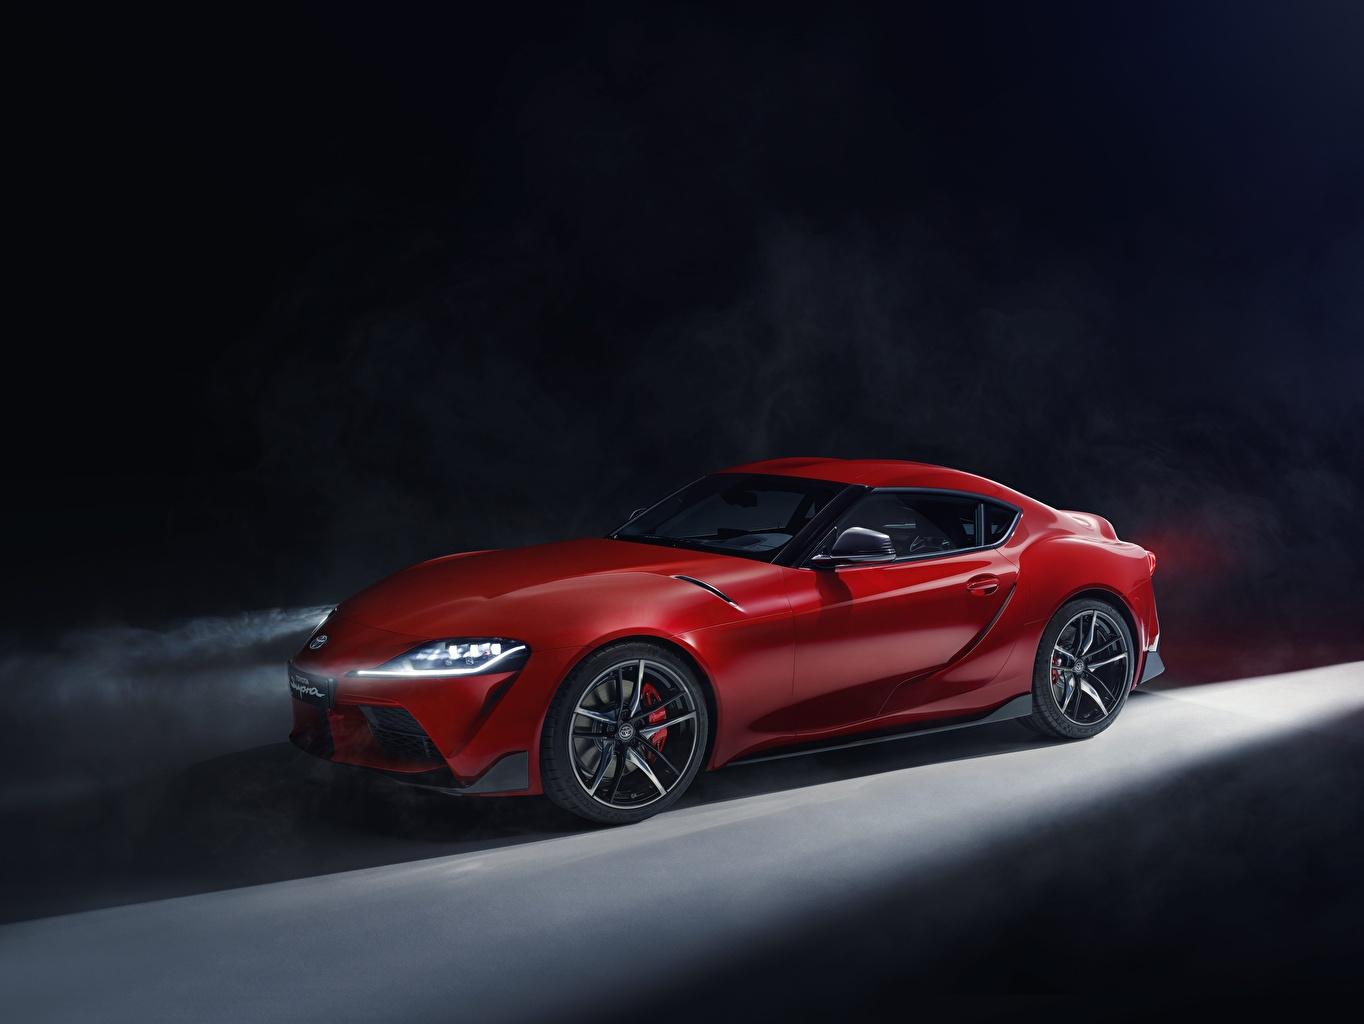 Foto Toyota Supra 2019 Rot Autos